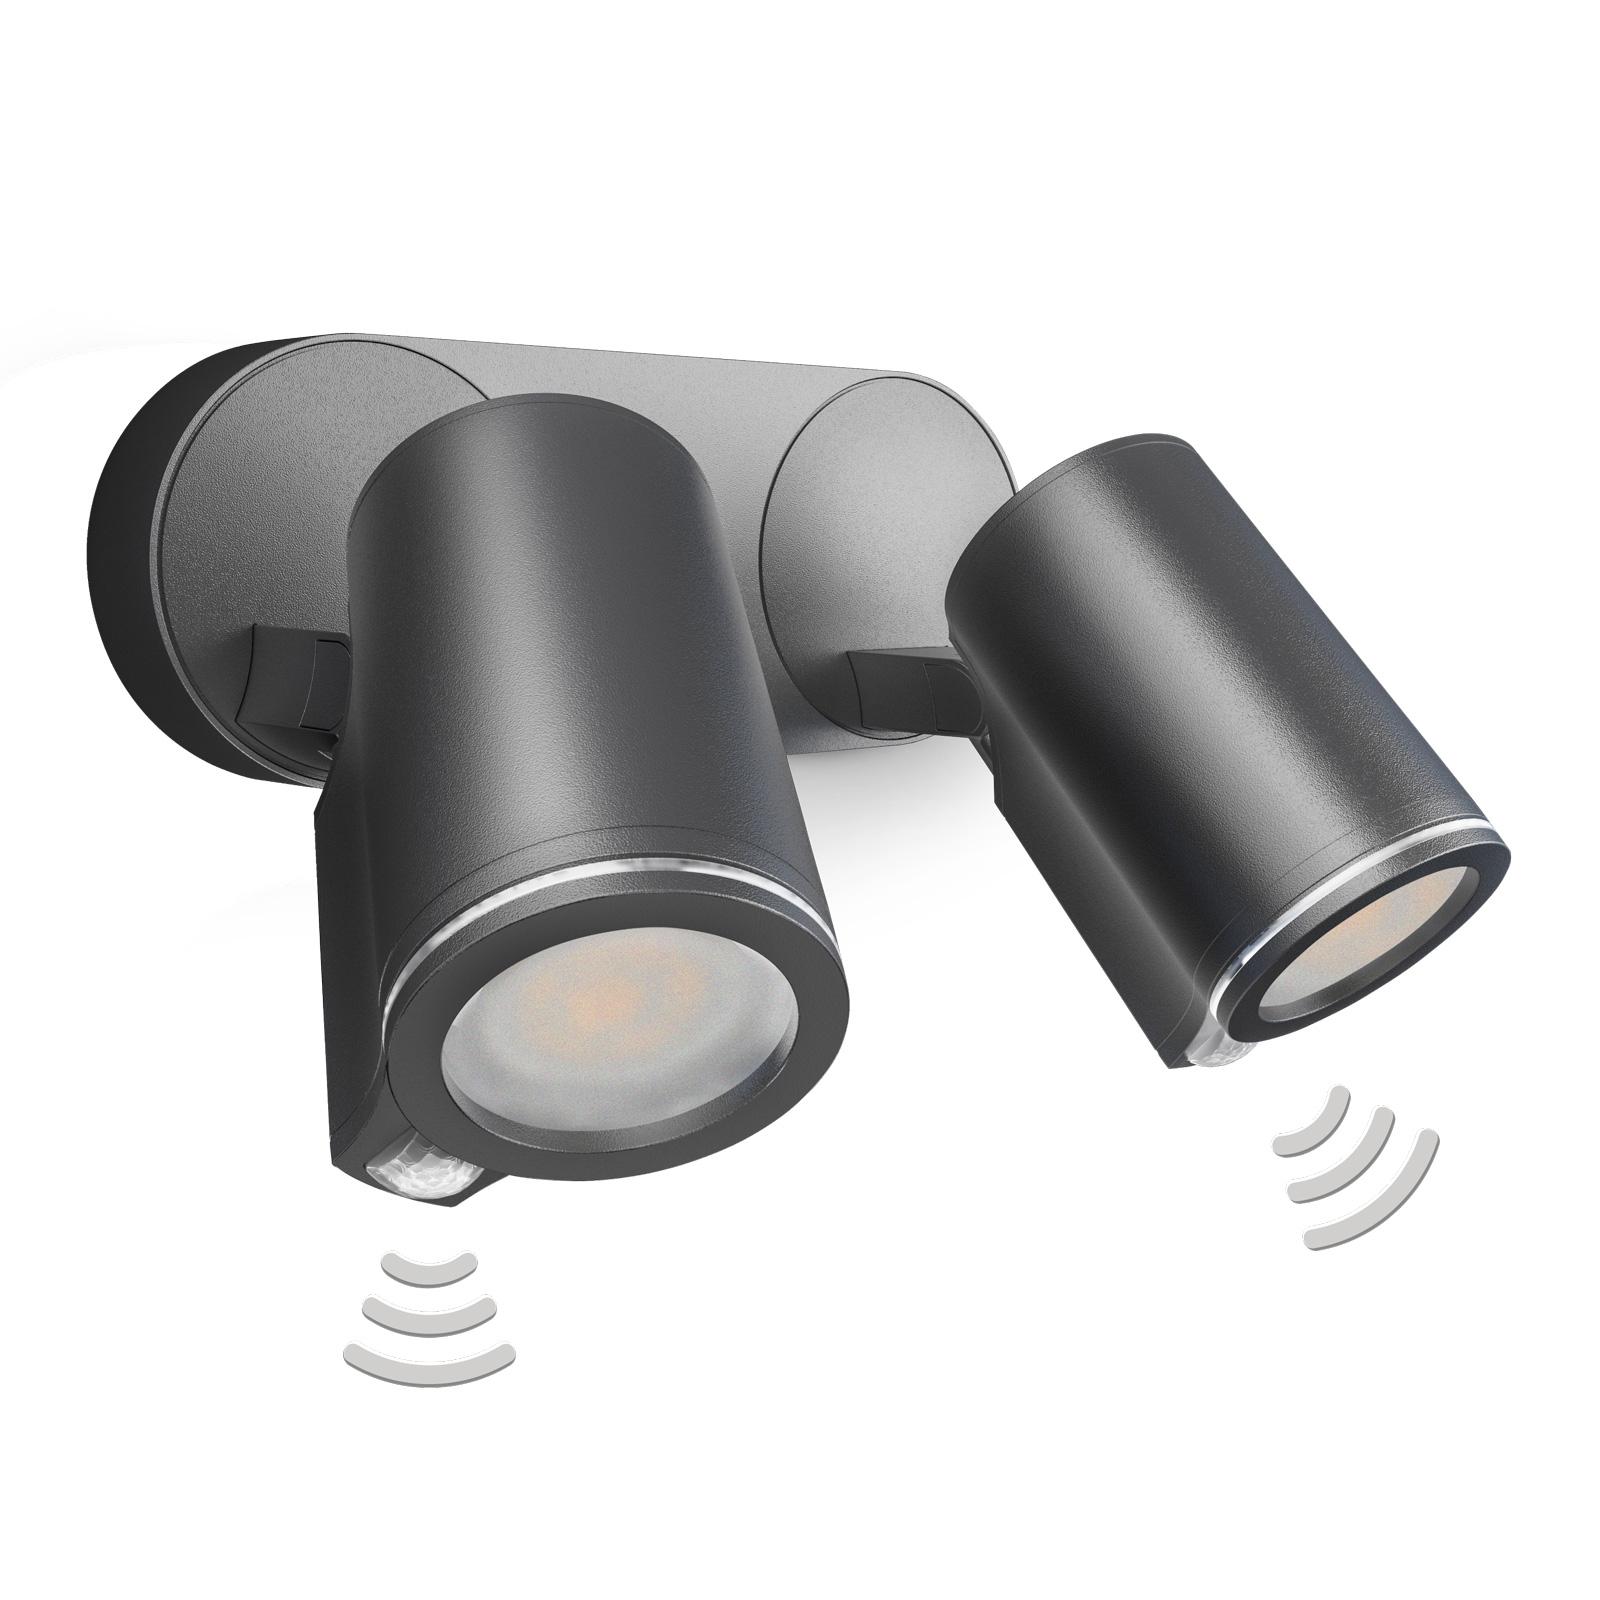 STEINEL Spot Duo Sensor Connect LED-spot, 2 lk.